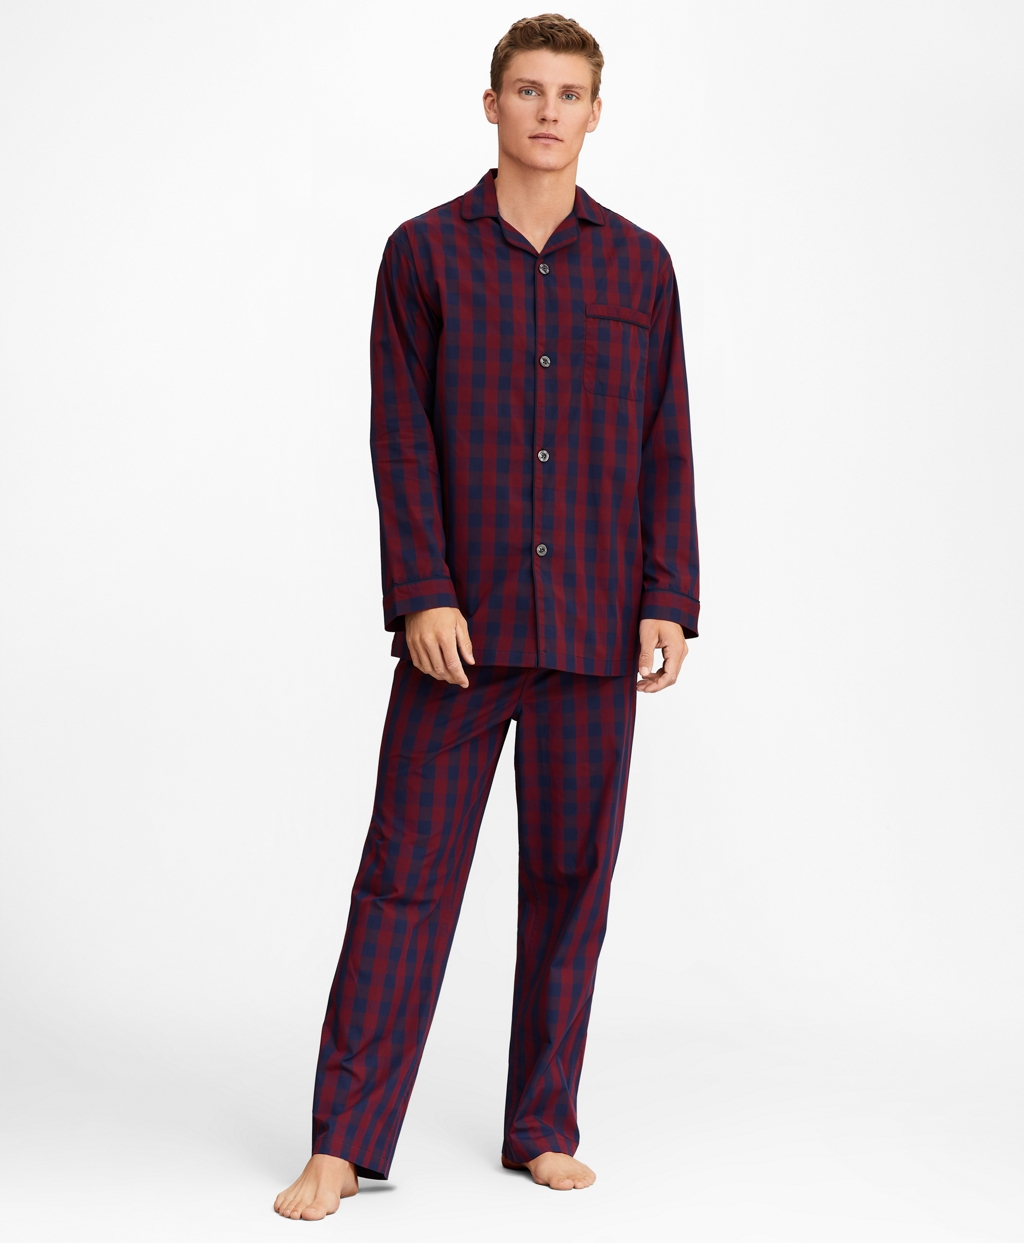 Vintage Men's Underwear Brooks Brothers Mens Buffalo Check Pajamas $98.50 AT vintagedancer.com